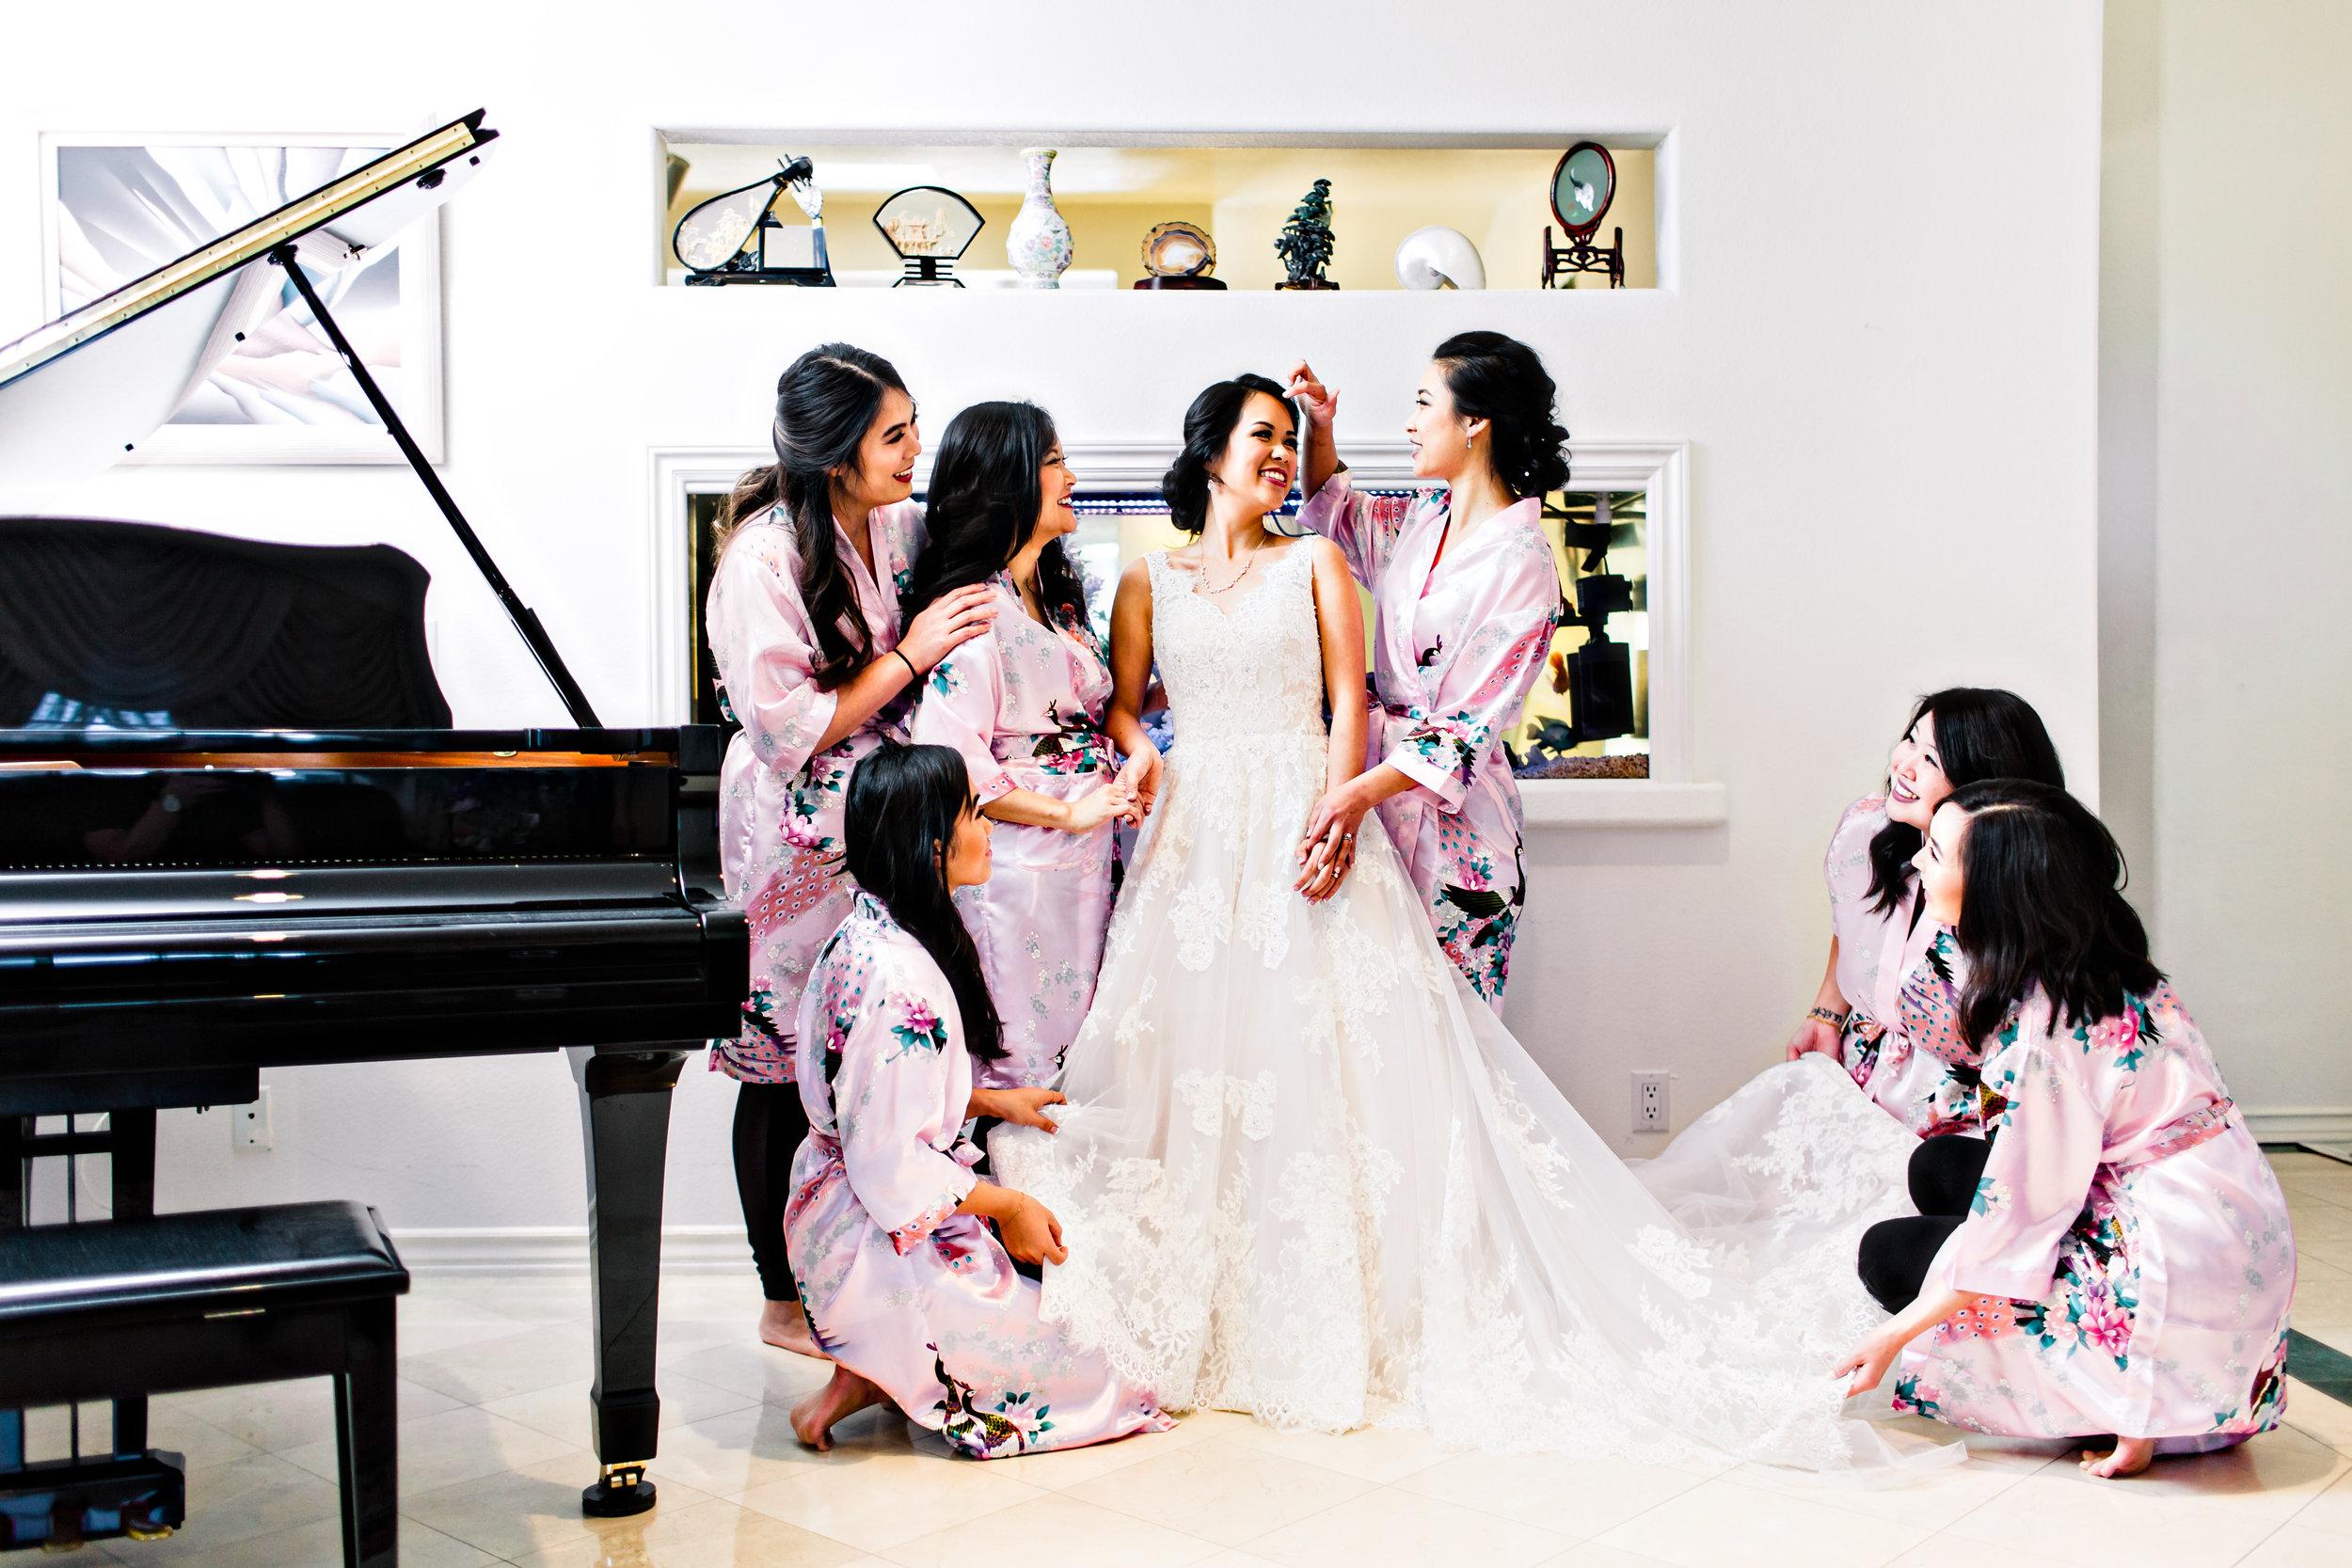 Knotts_Berry_Farm_Hotel_Wedding-118.jpg